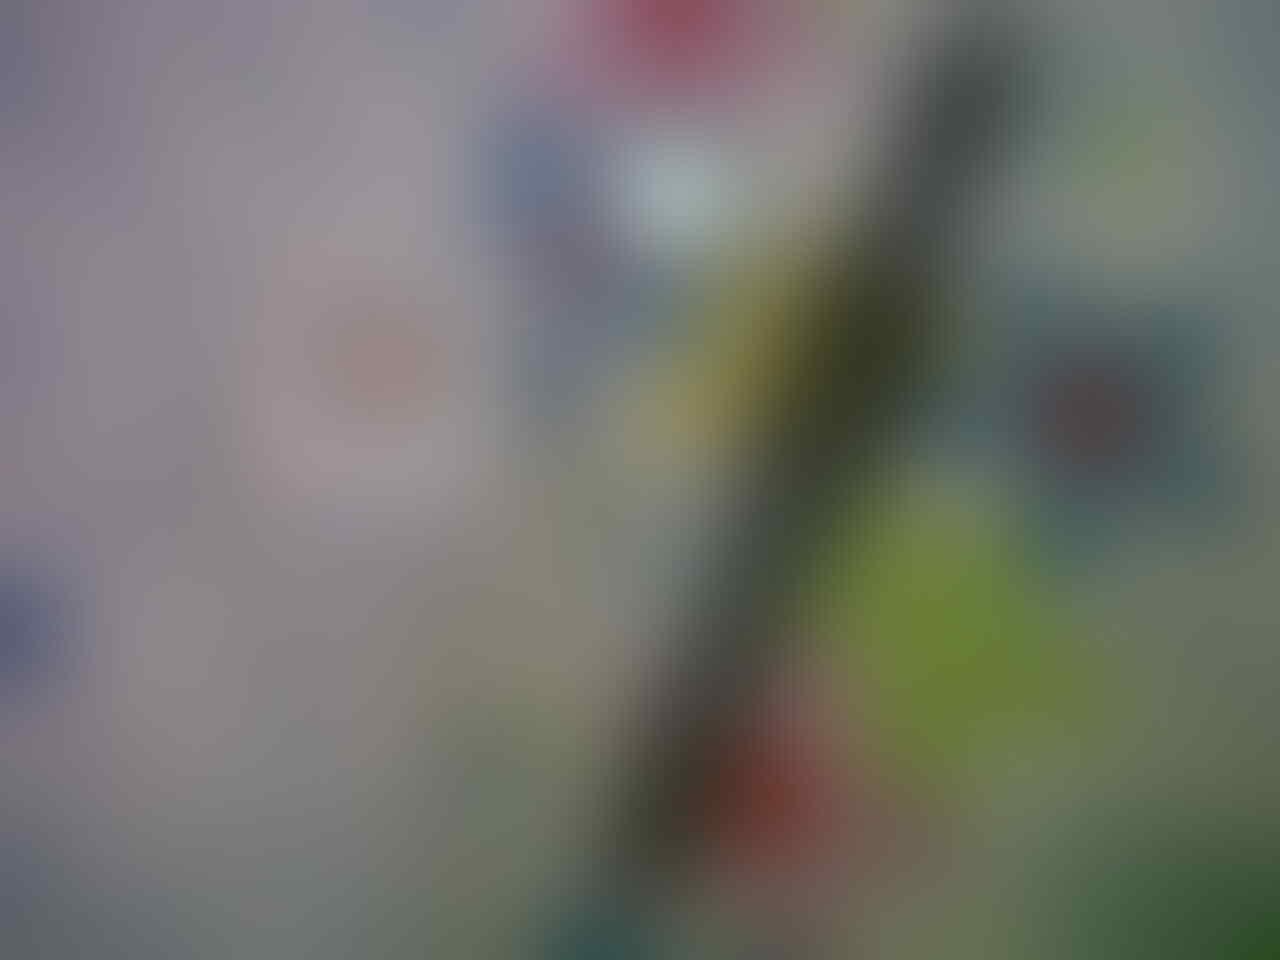 ipod nano 6th silver + bonus iwatchz masih garansi ampe feb 2013 bandung